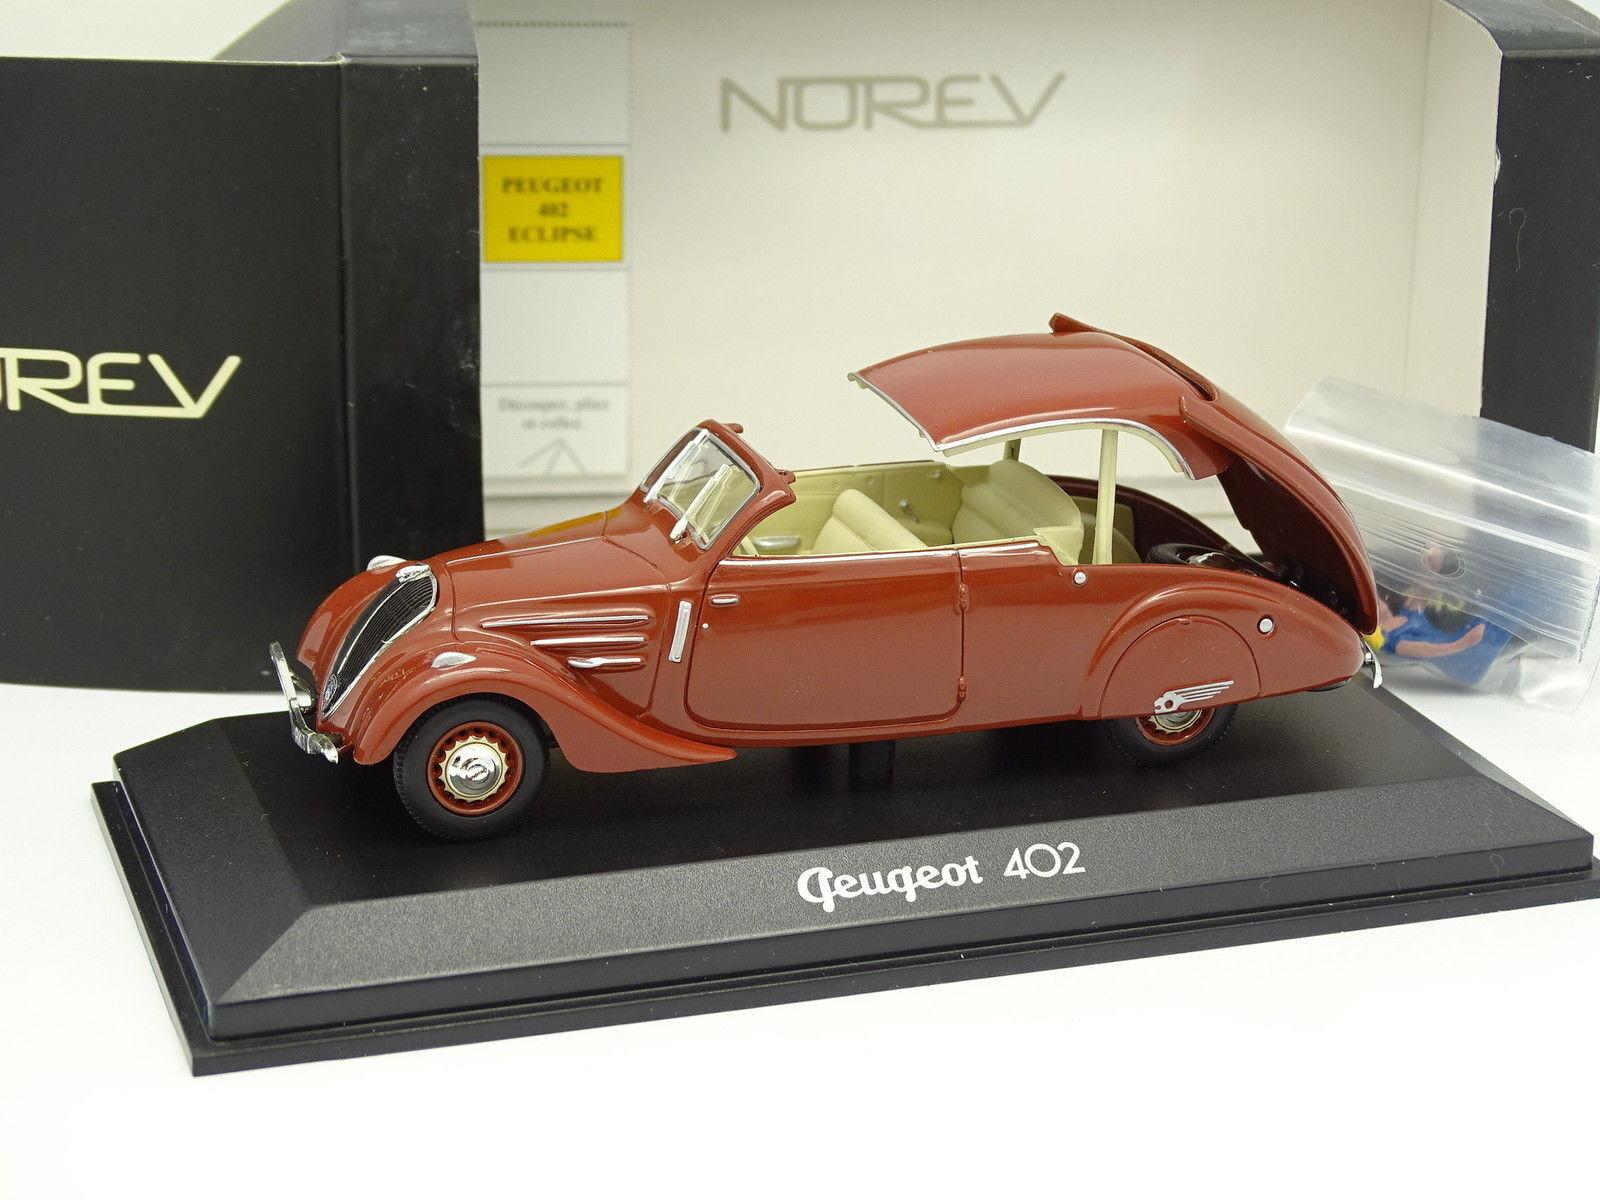 Norev CEC 1 43 - Peugeot 402 Eclipse 1936 Brown + Figurine